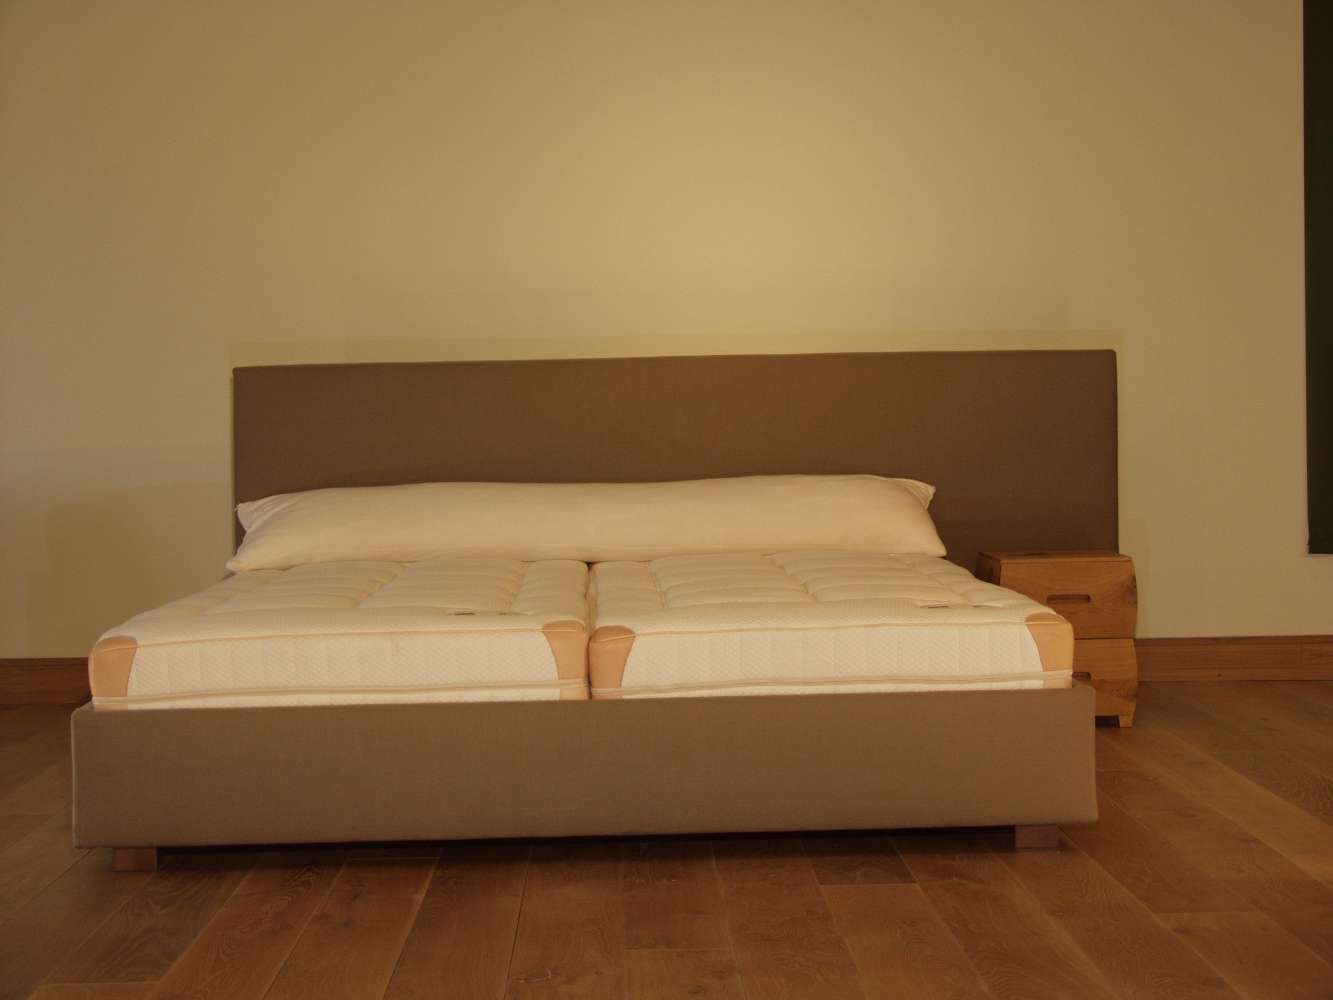 dormiente Polsterbett Aura 180*200 Bezug Toscana Farbe Taupe